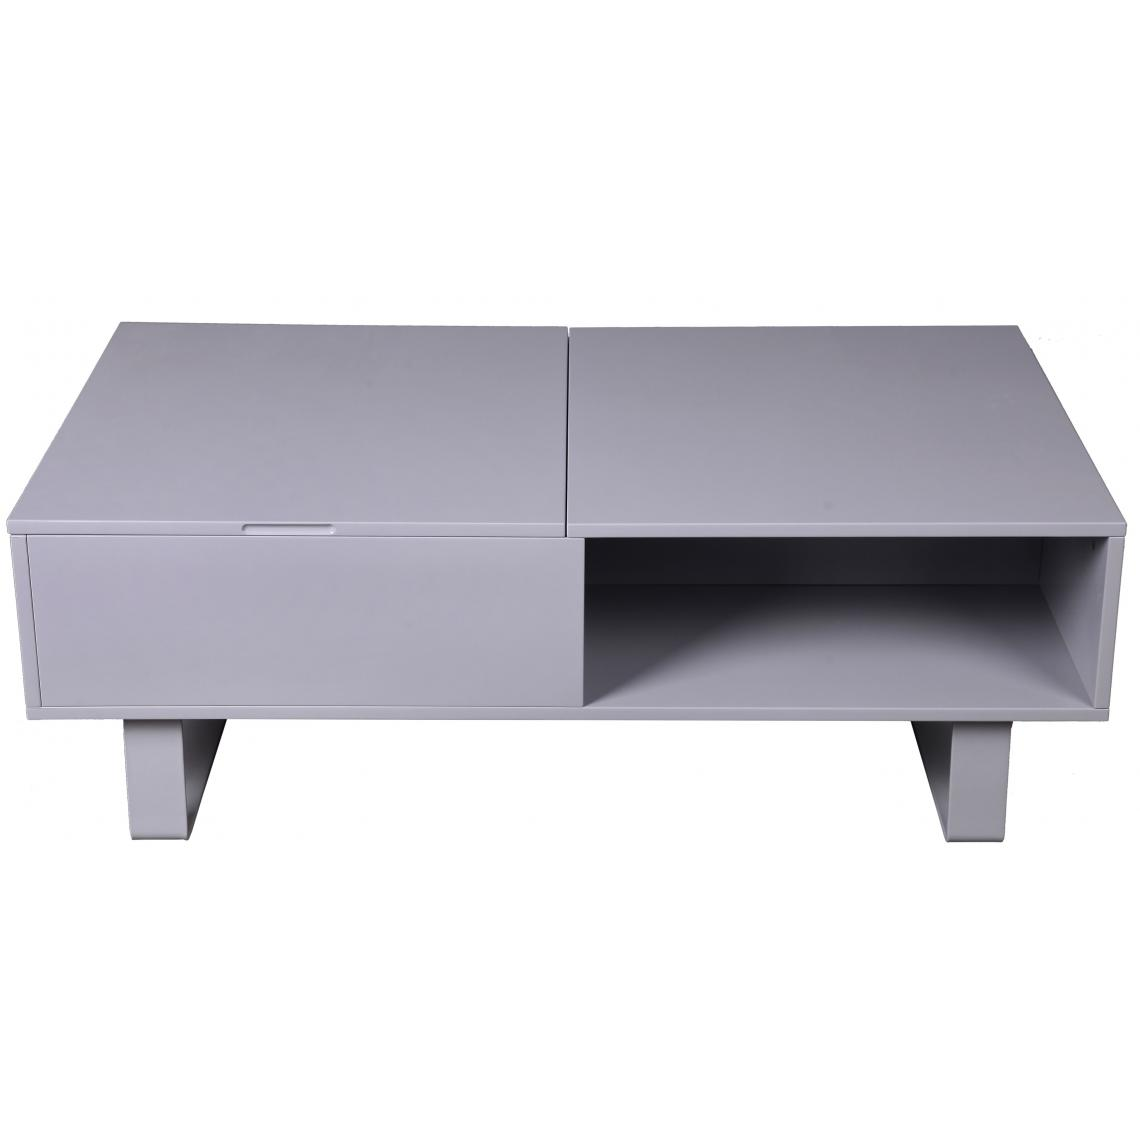 table basse grise avec plateau relevable melvin 3 suisses. Black Bedroom Furniture Sets. Home Design Ideas